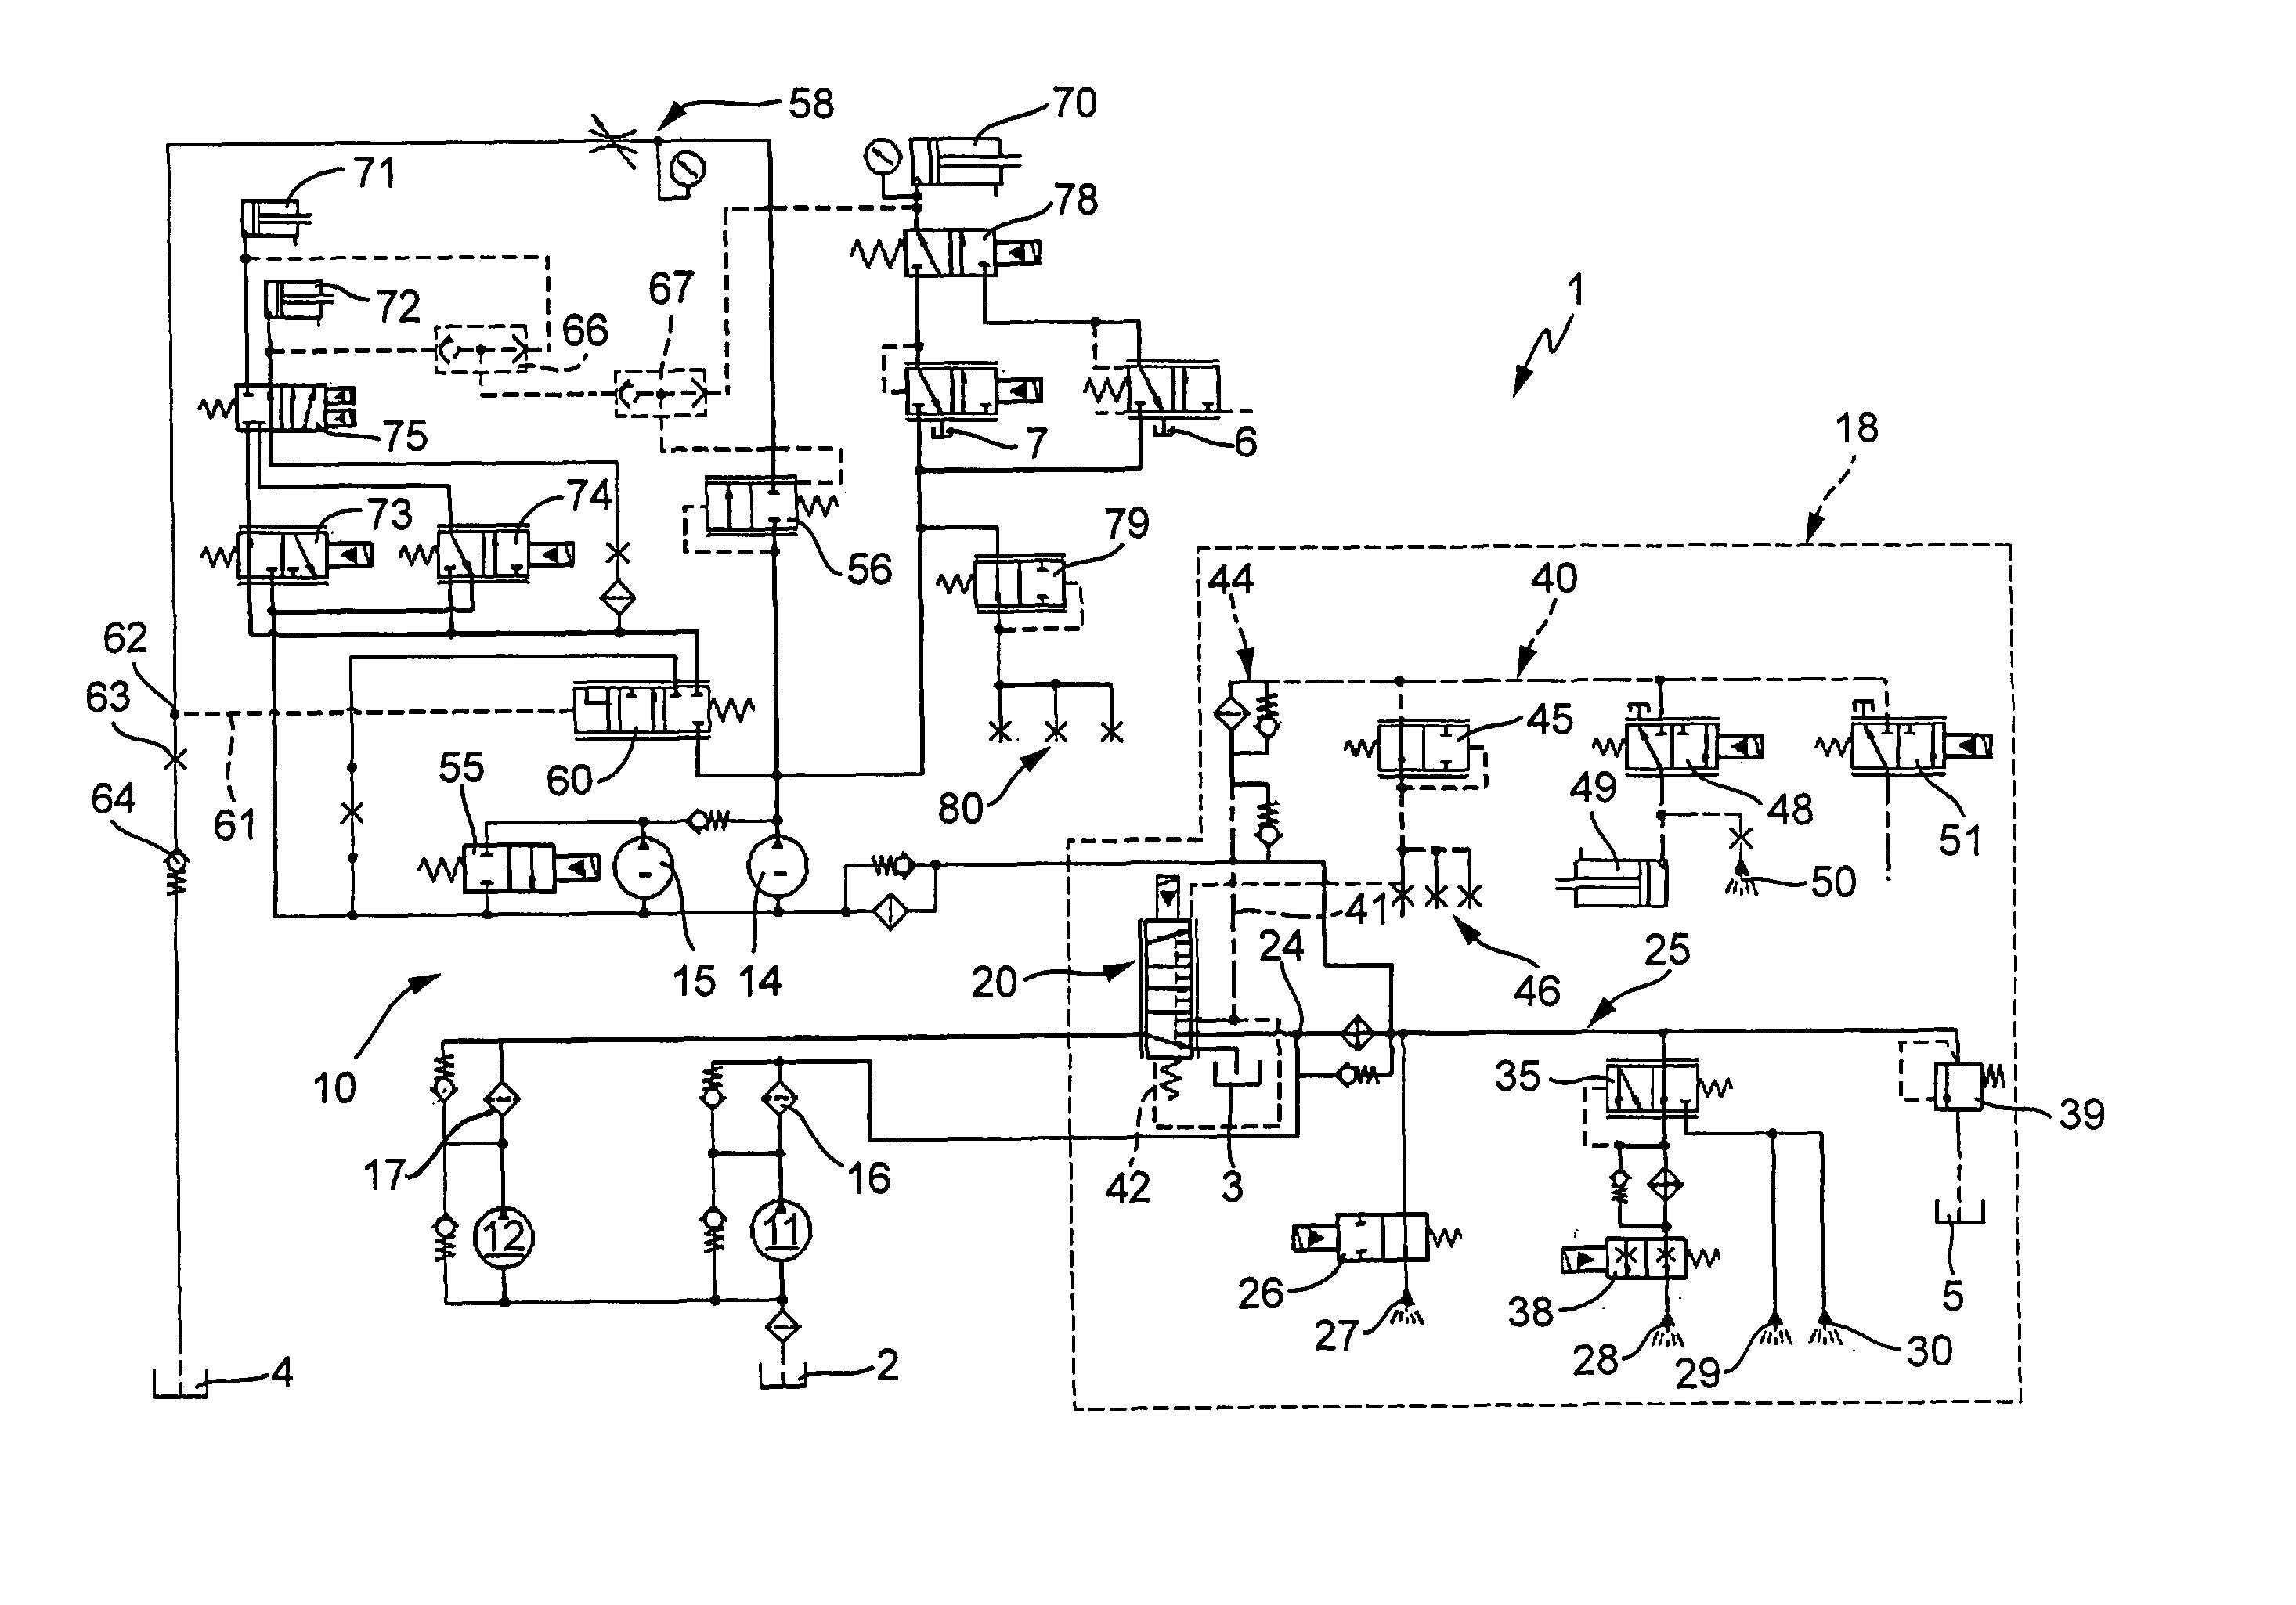 Hydraulic Pressure Transducer Schematic